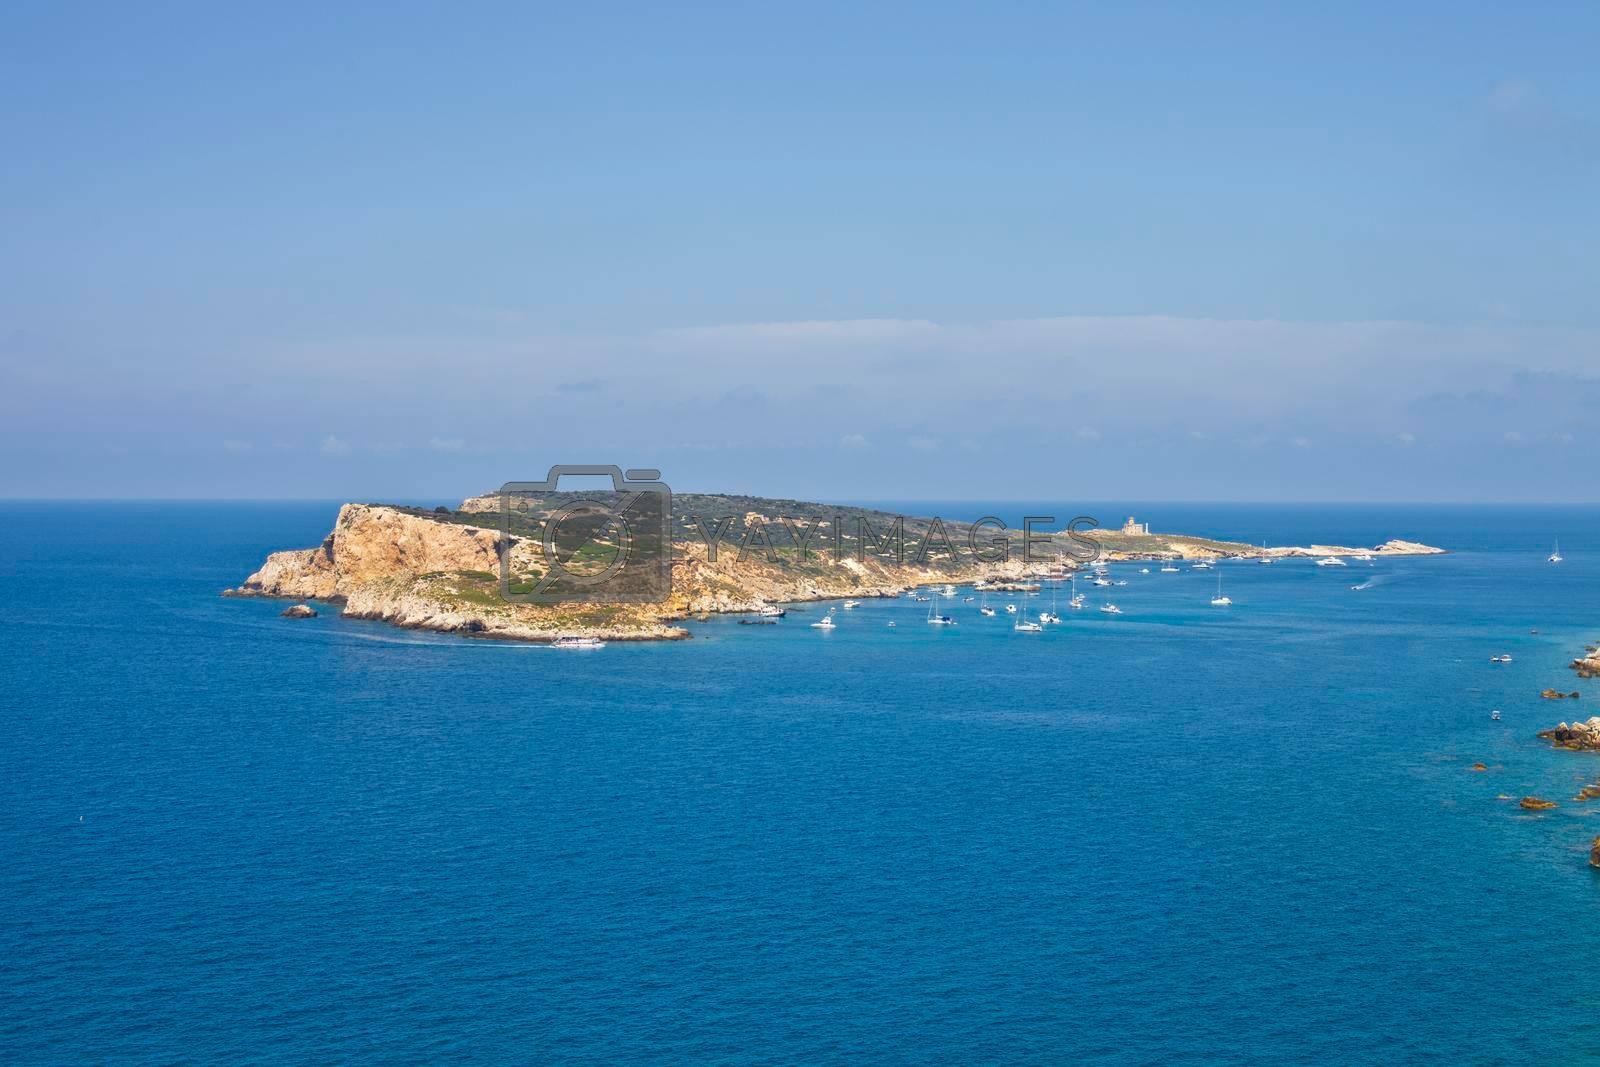 View of the Tremiti Islands. Capraia Island, Italy: scenic view of tipycal rocky coastline. Adriatic Sea. Puglia, Italy.